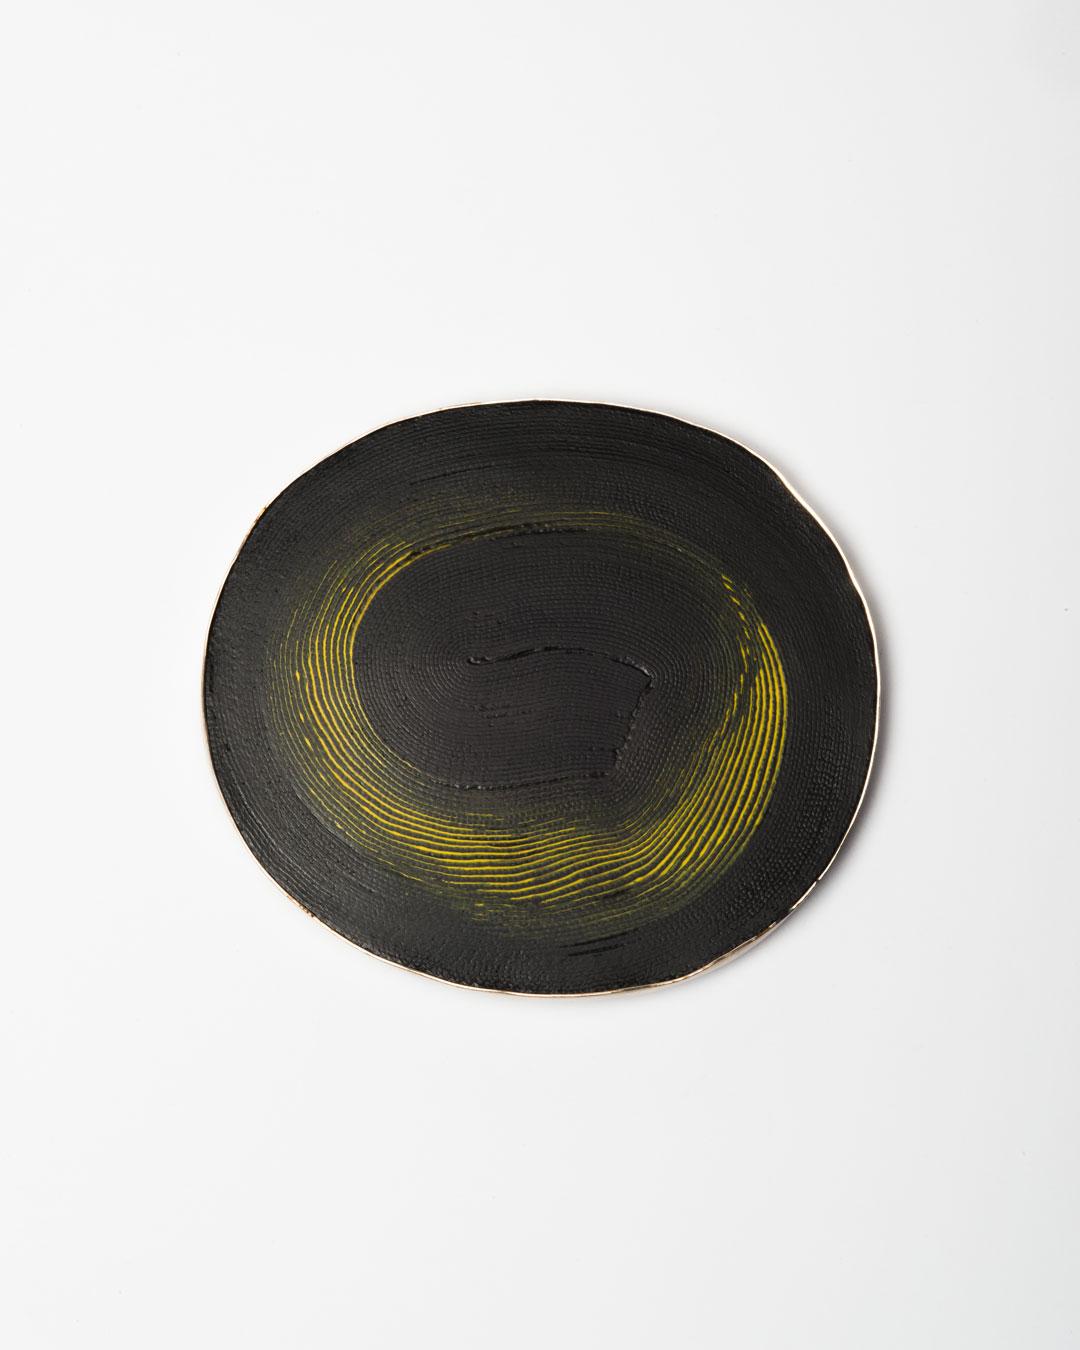 Shin Hea Lim, Drew a Rain I, 2018, brooch; linen, silver, ottchil (lacquer), 103 x 92 x 10 mm, €1250